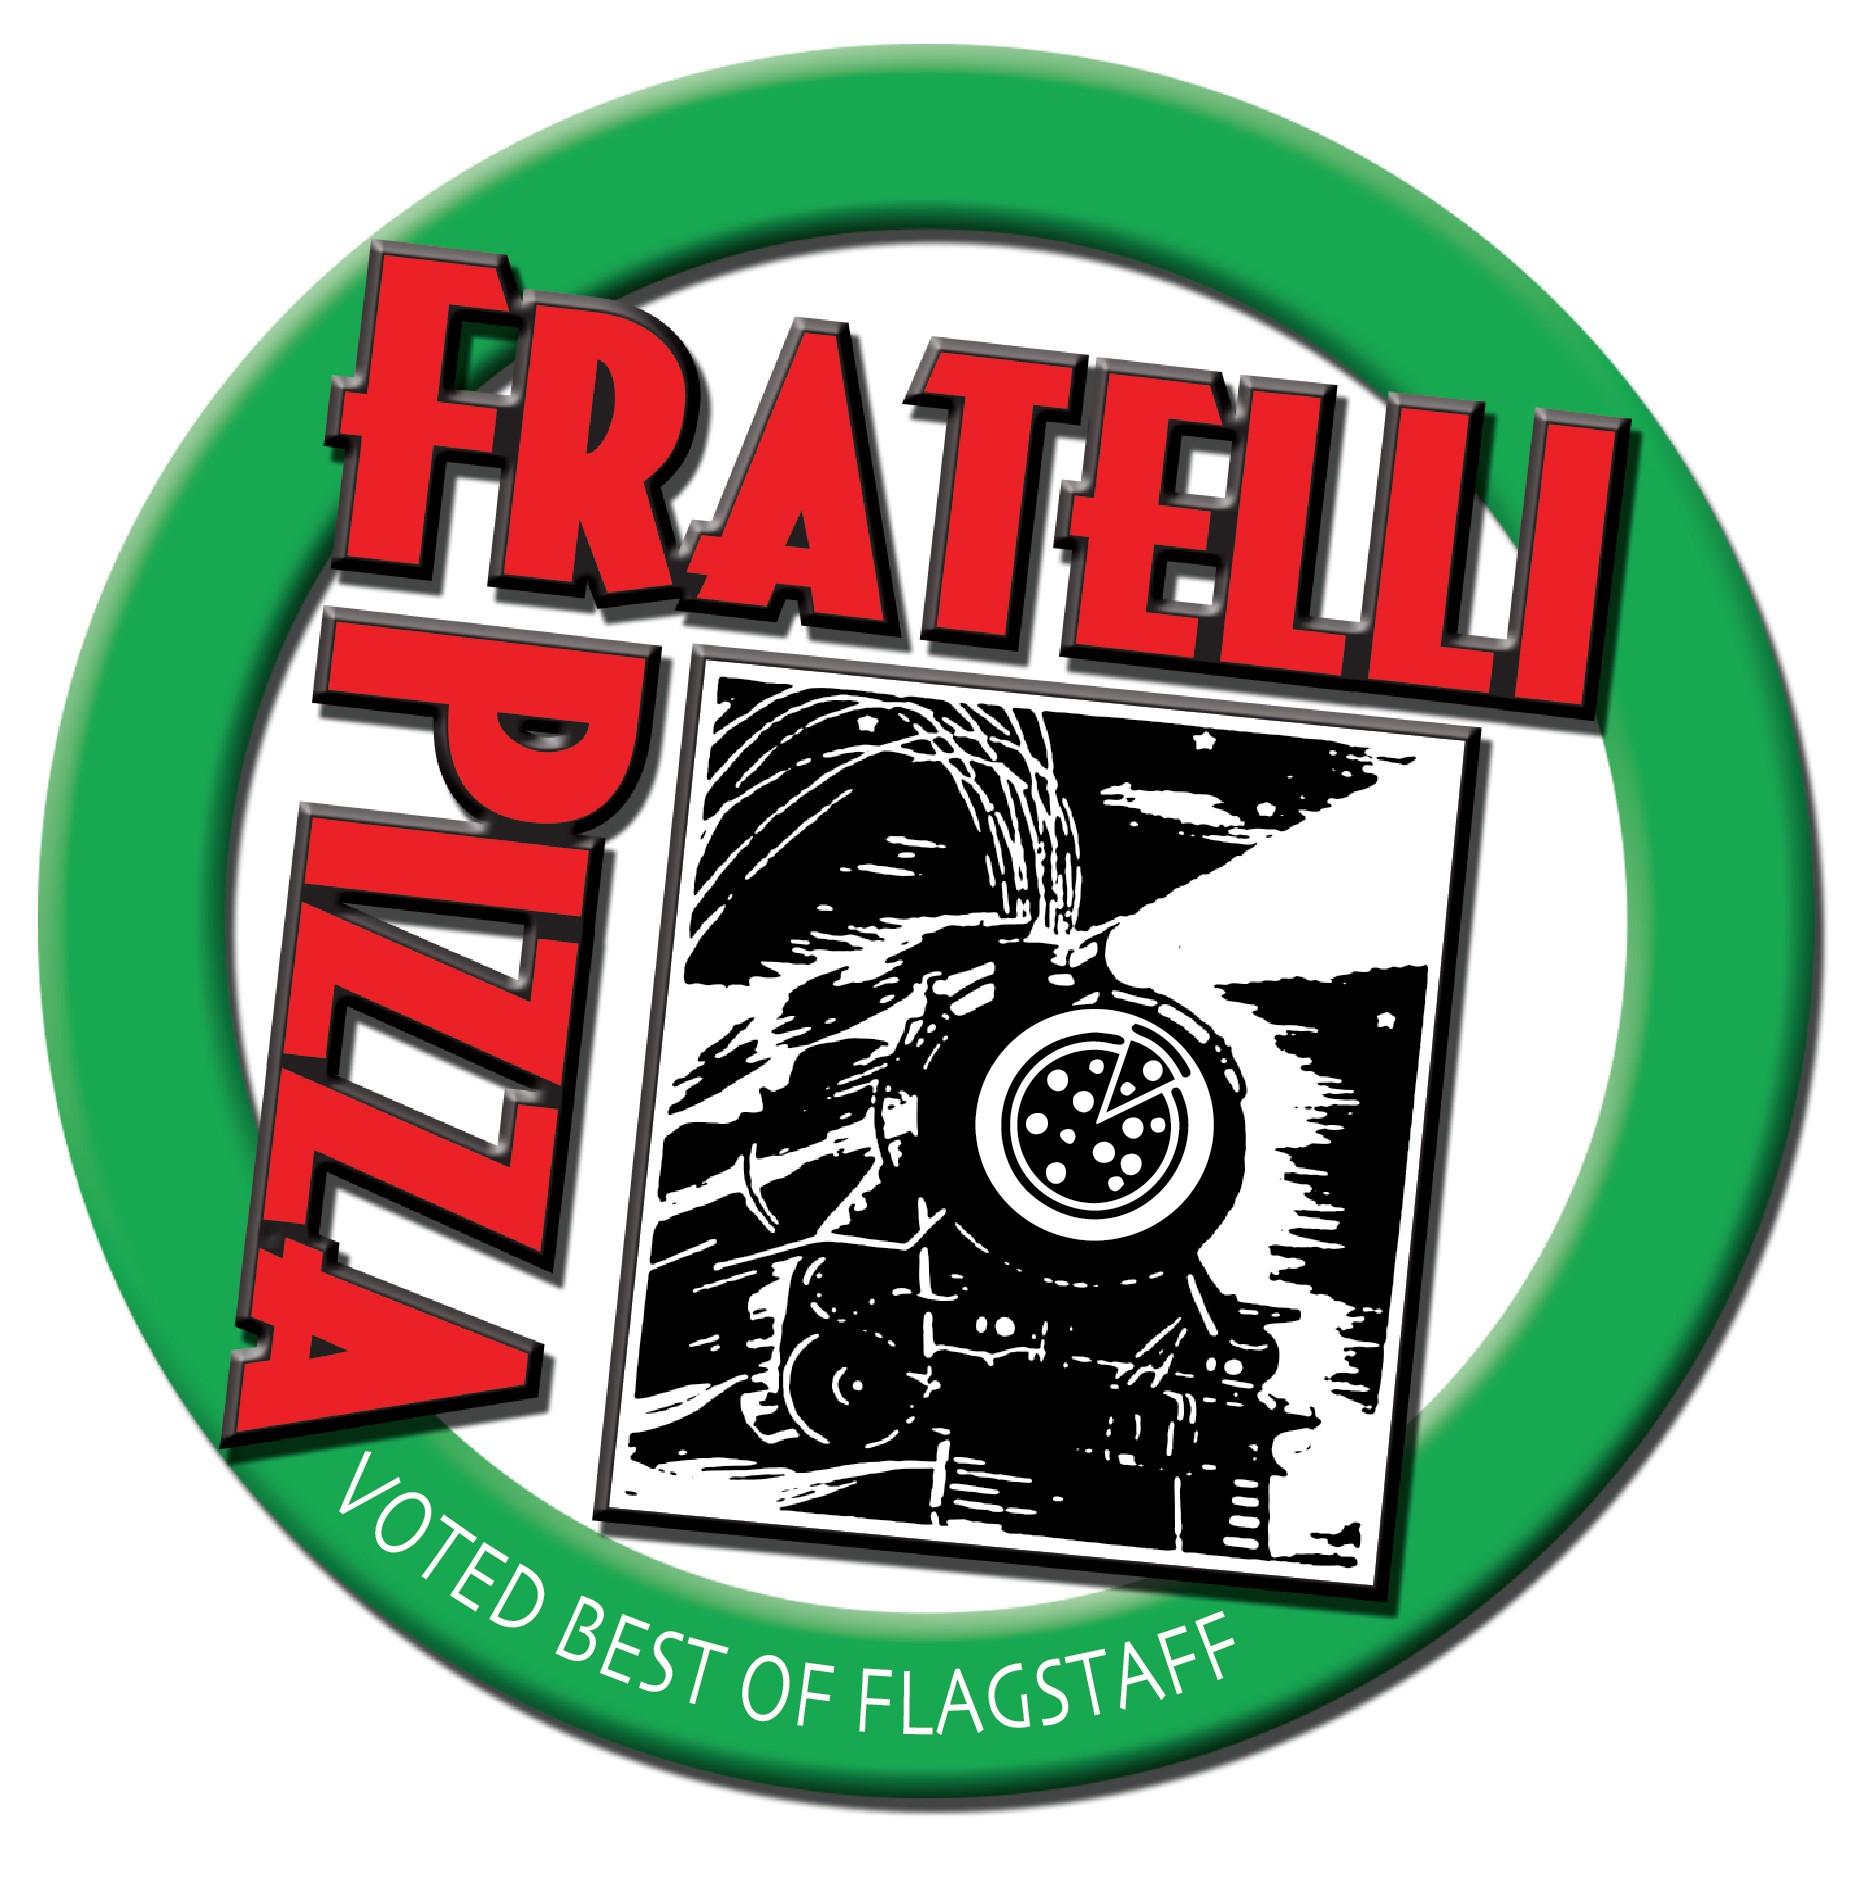 Fratelli 2017 Logo.jpg